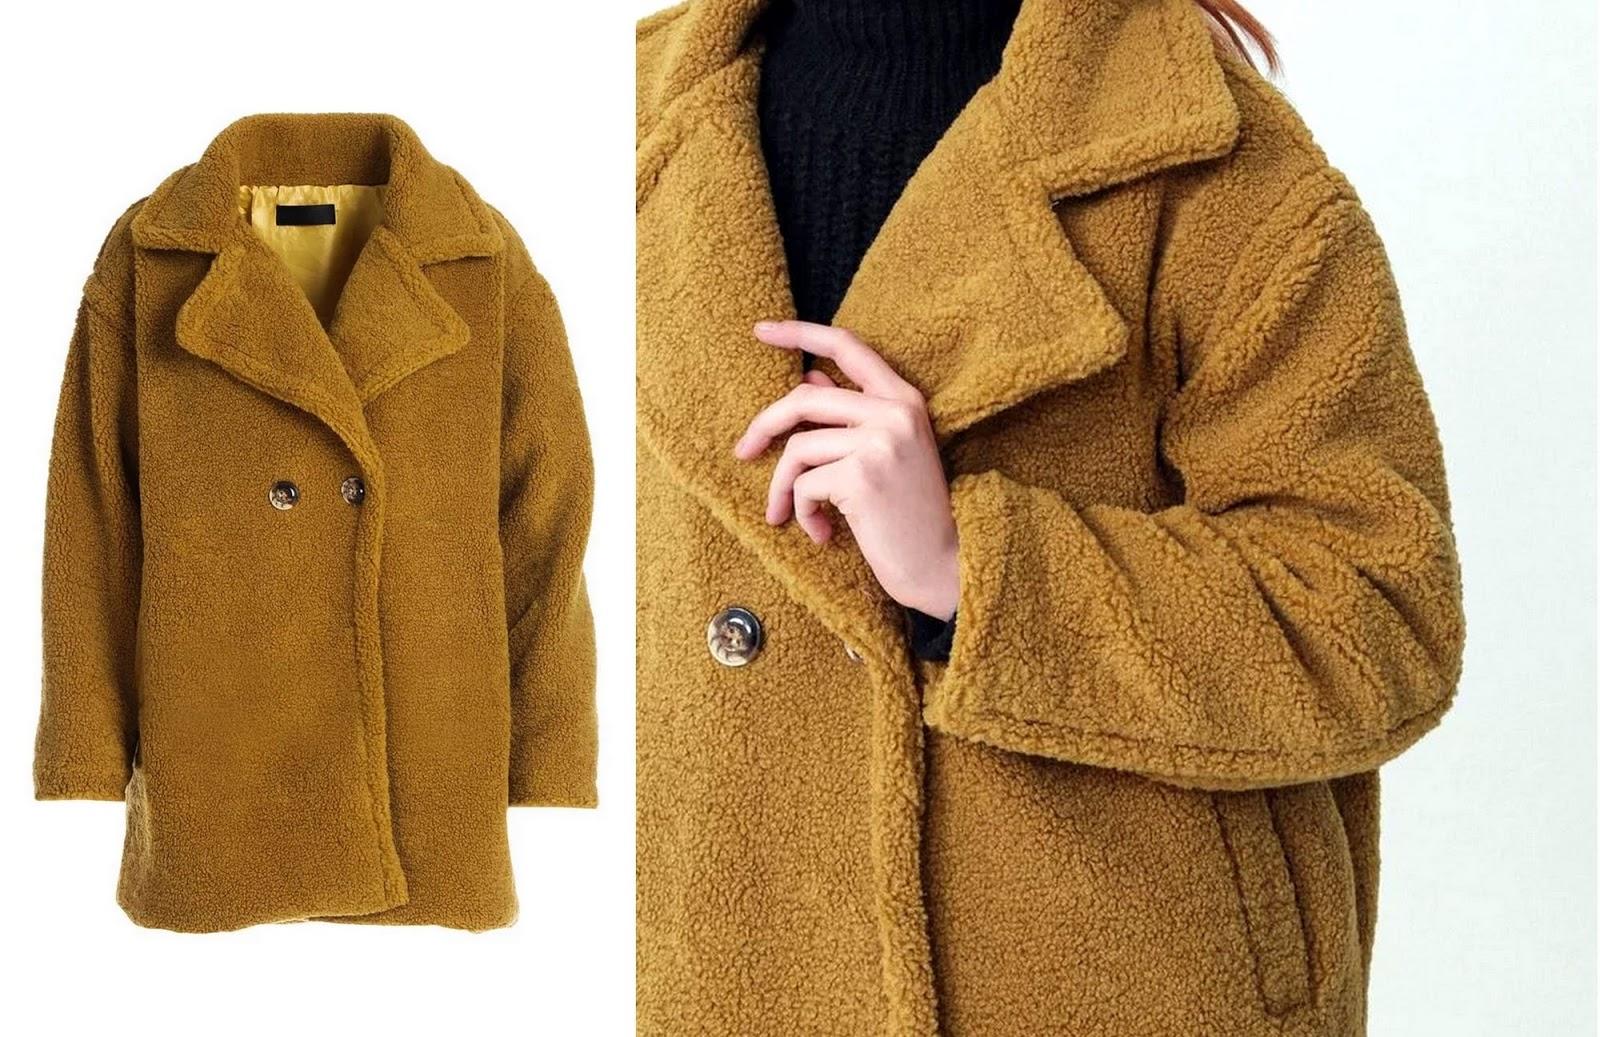 Płaszcze z imitacji futerka à la baranek